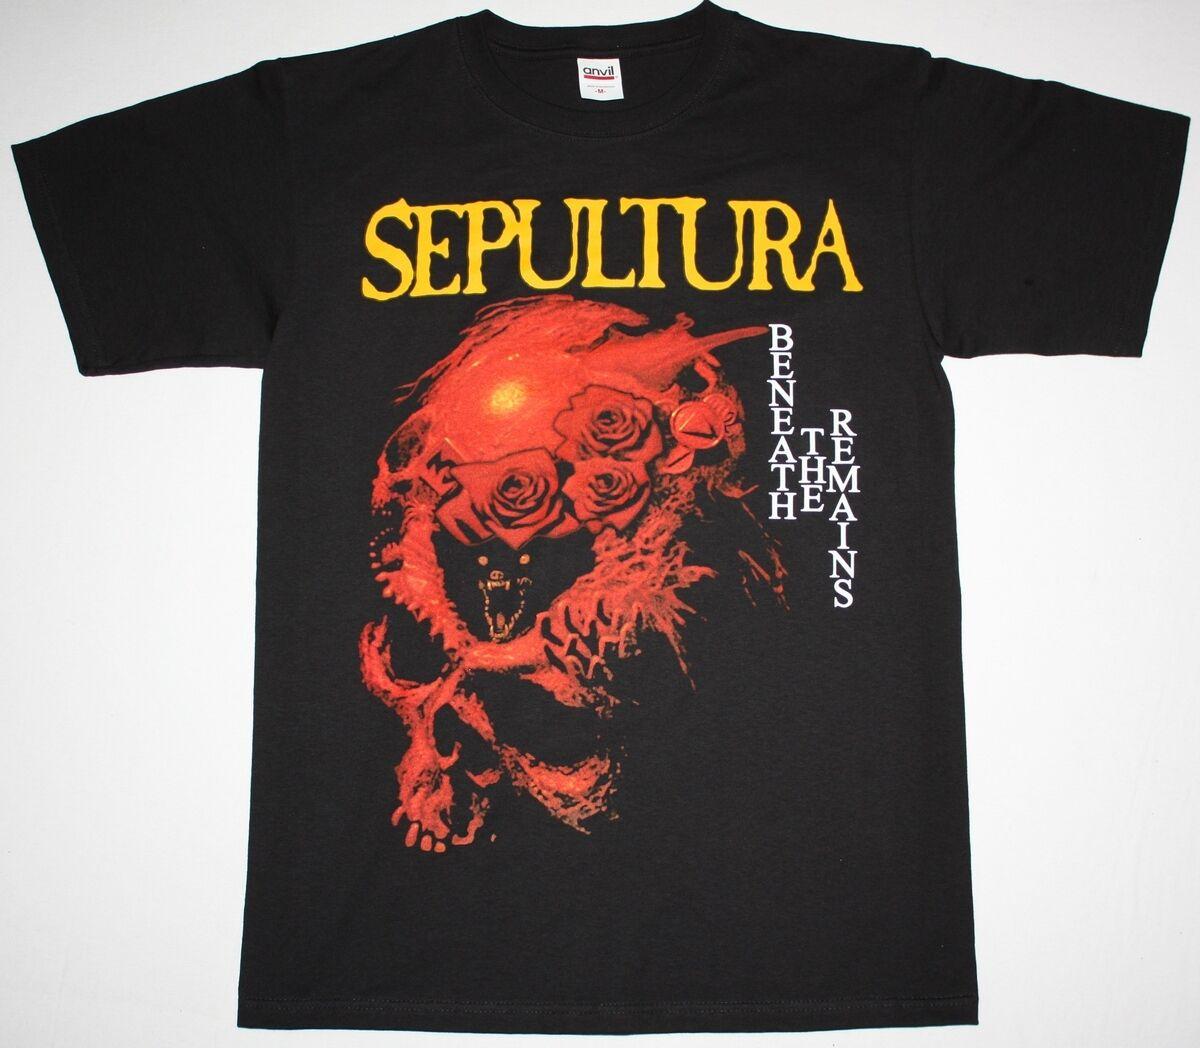 SEPULTURA BENEATH THE REMAINS SOULFLY CAVALERA DEATH METAL NEW BLACK T SHIRT Cheap Wholesale tees,100% Cotton Tee Shirt